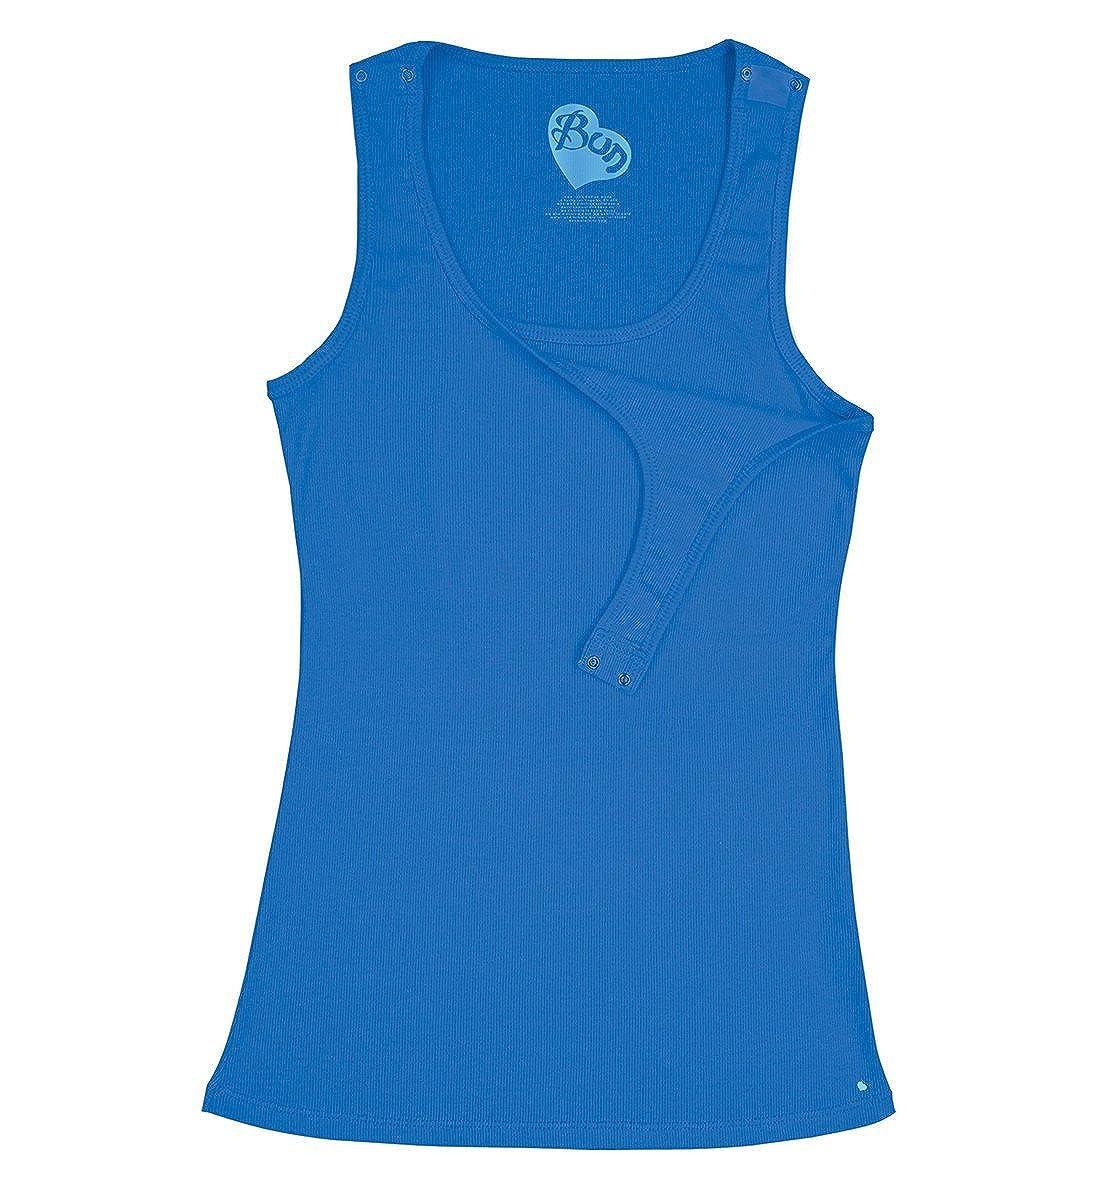 7ab3034d0874f Amazon.com: Bun Maternity Women's Maternity Ribbed Snap Nursing Tank Top:  Clothing